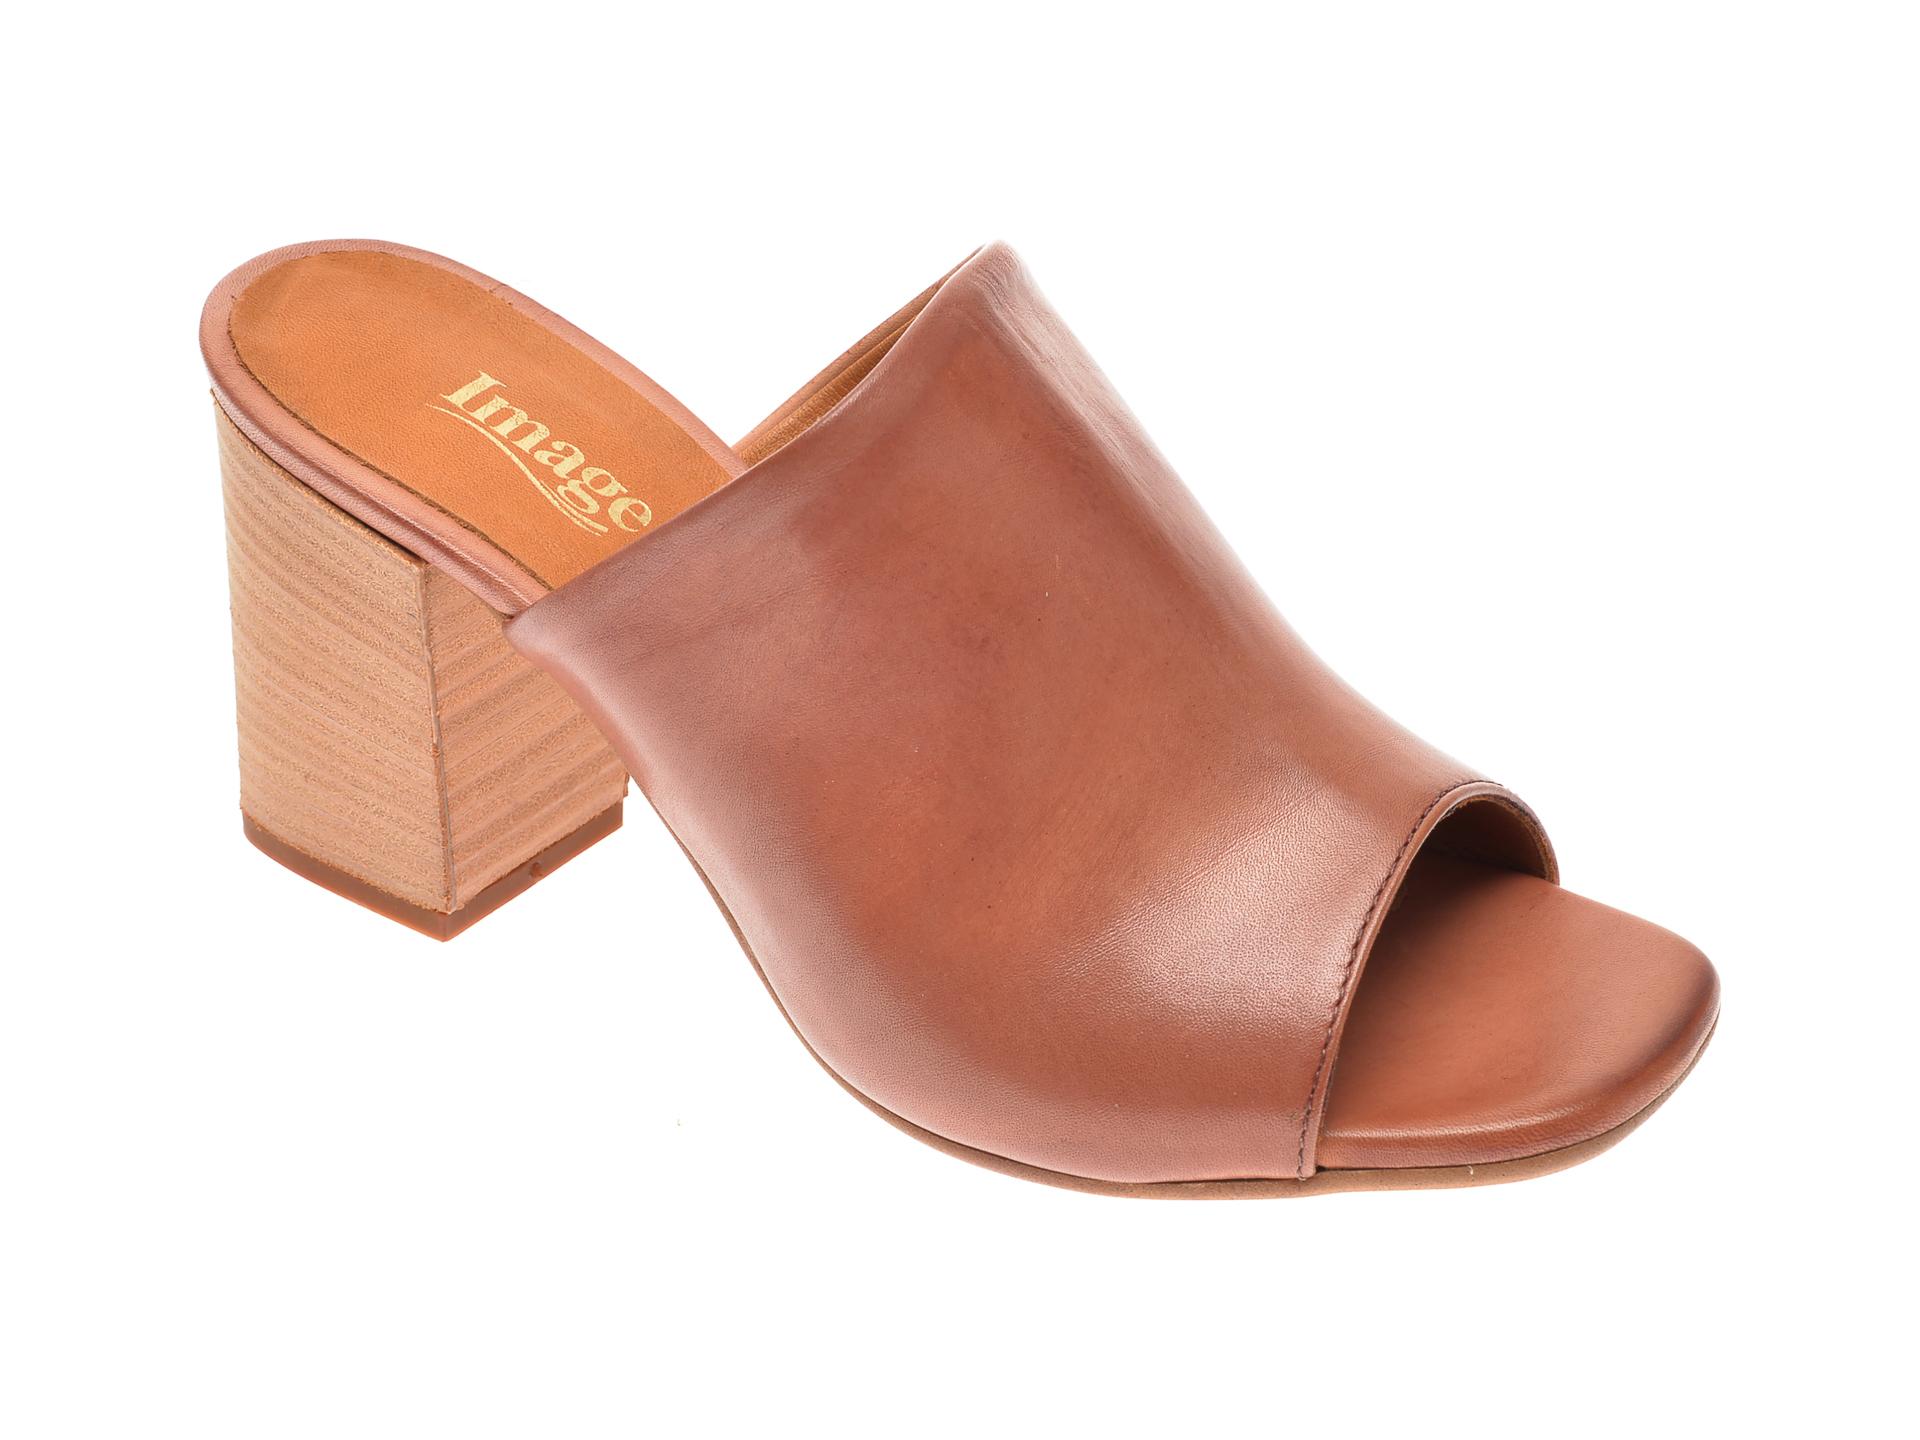 Papuci IMAGE negri, 4018, din piele naturala